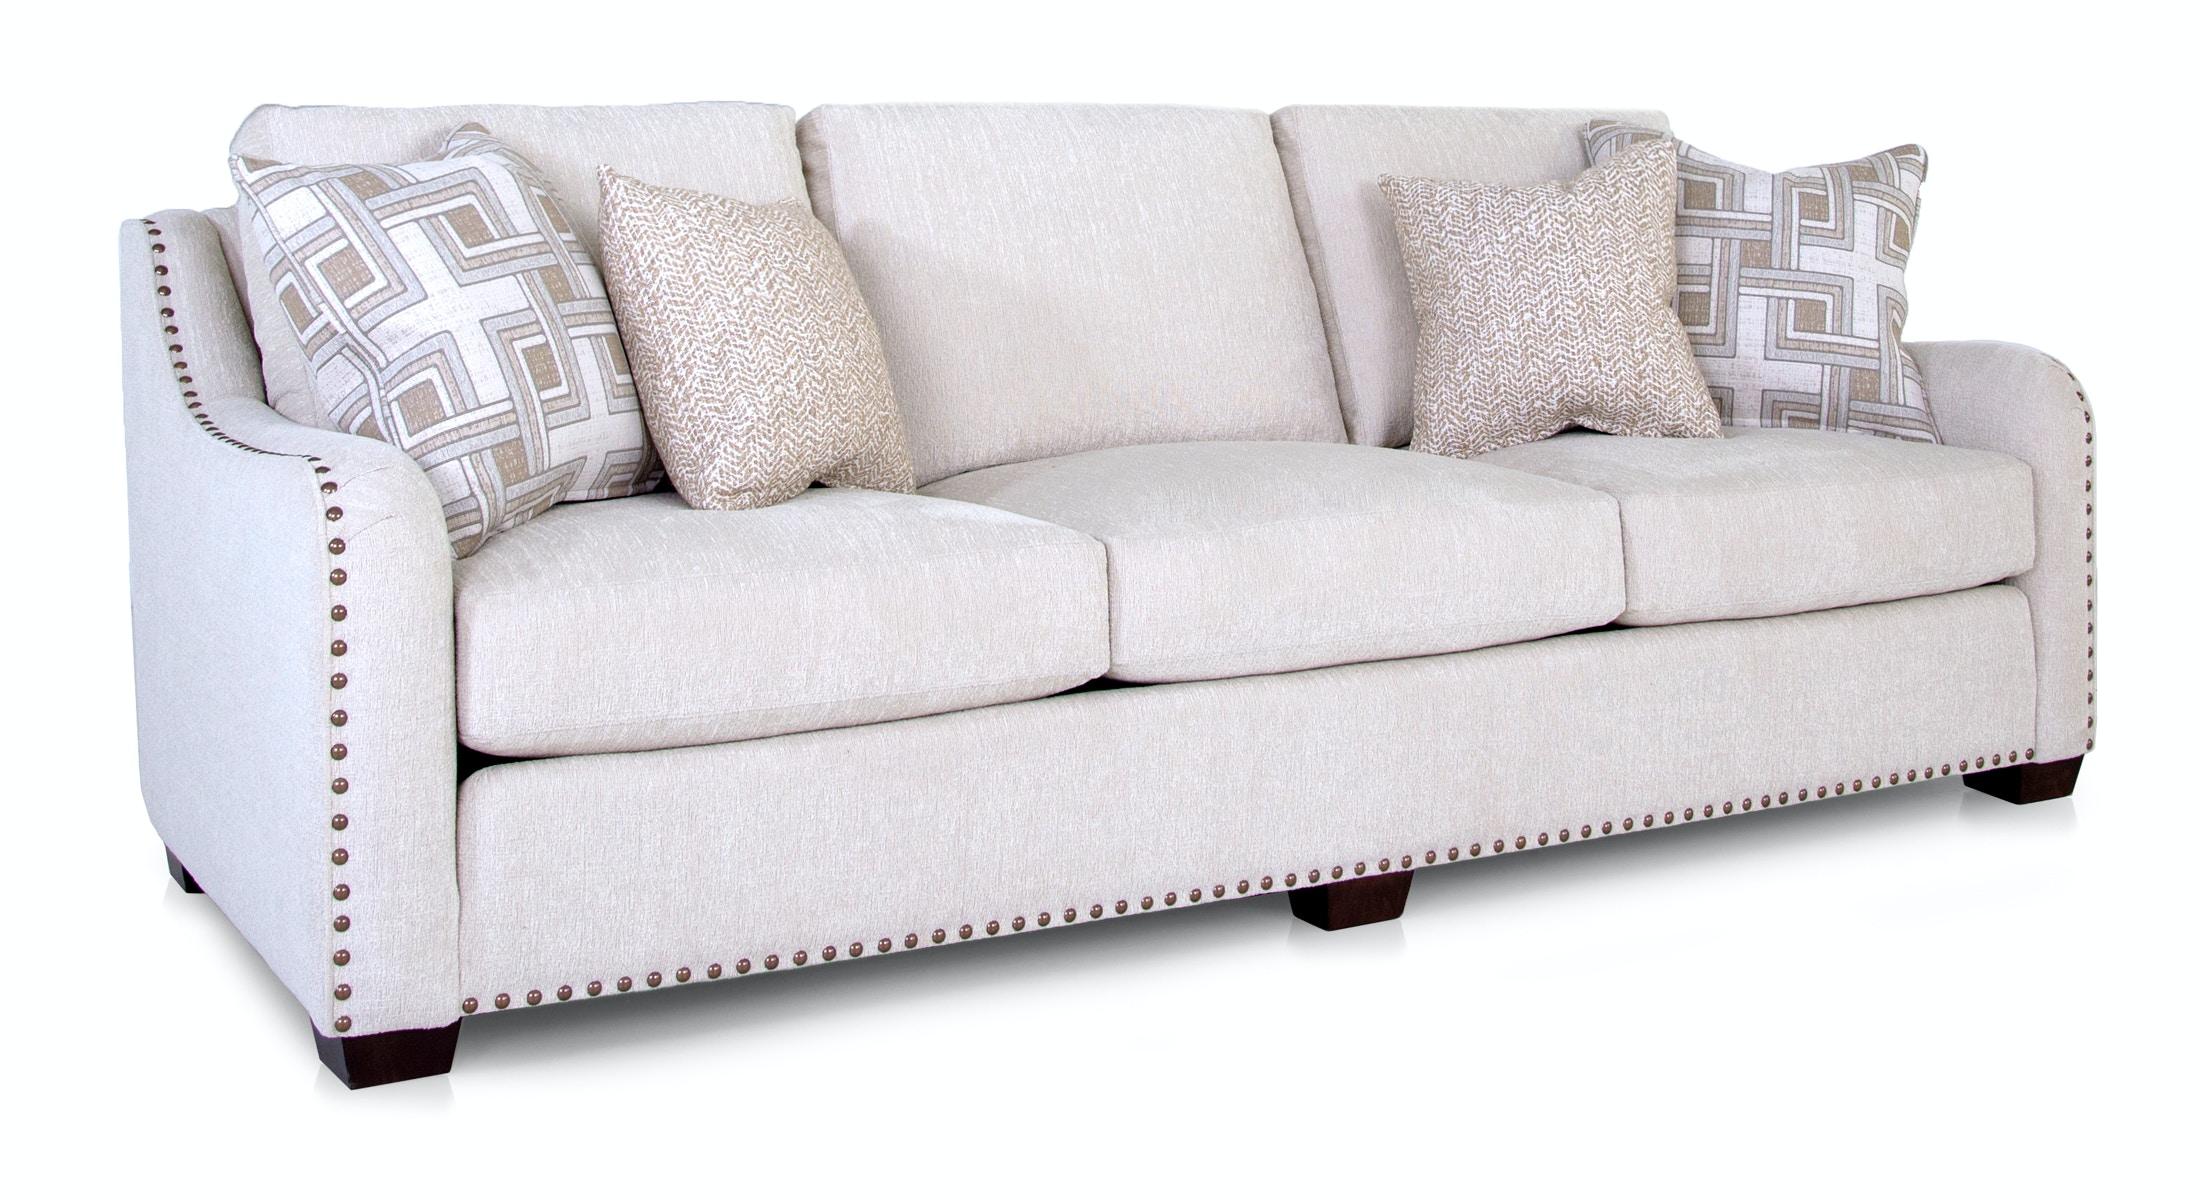 smith brothers english nailhead trim sofa - Nailhead Sofa